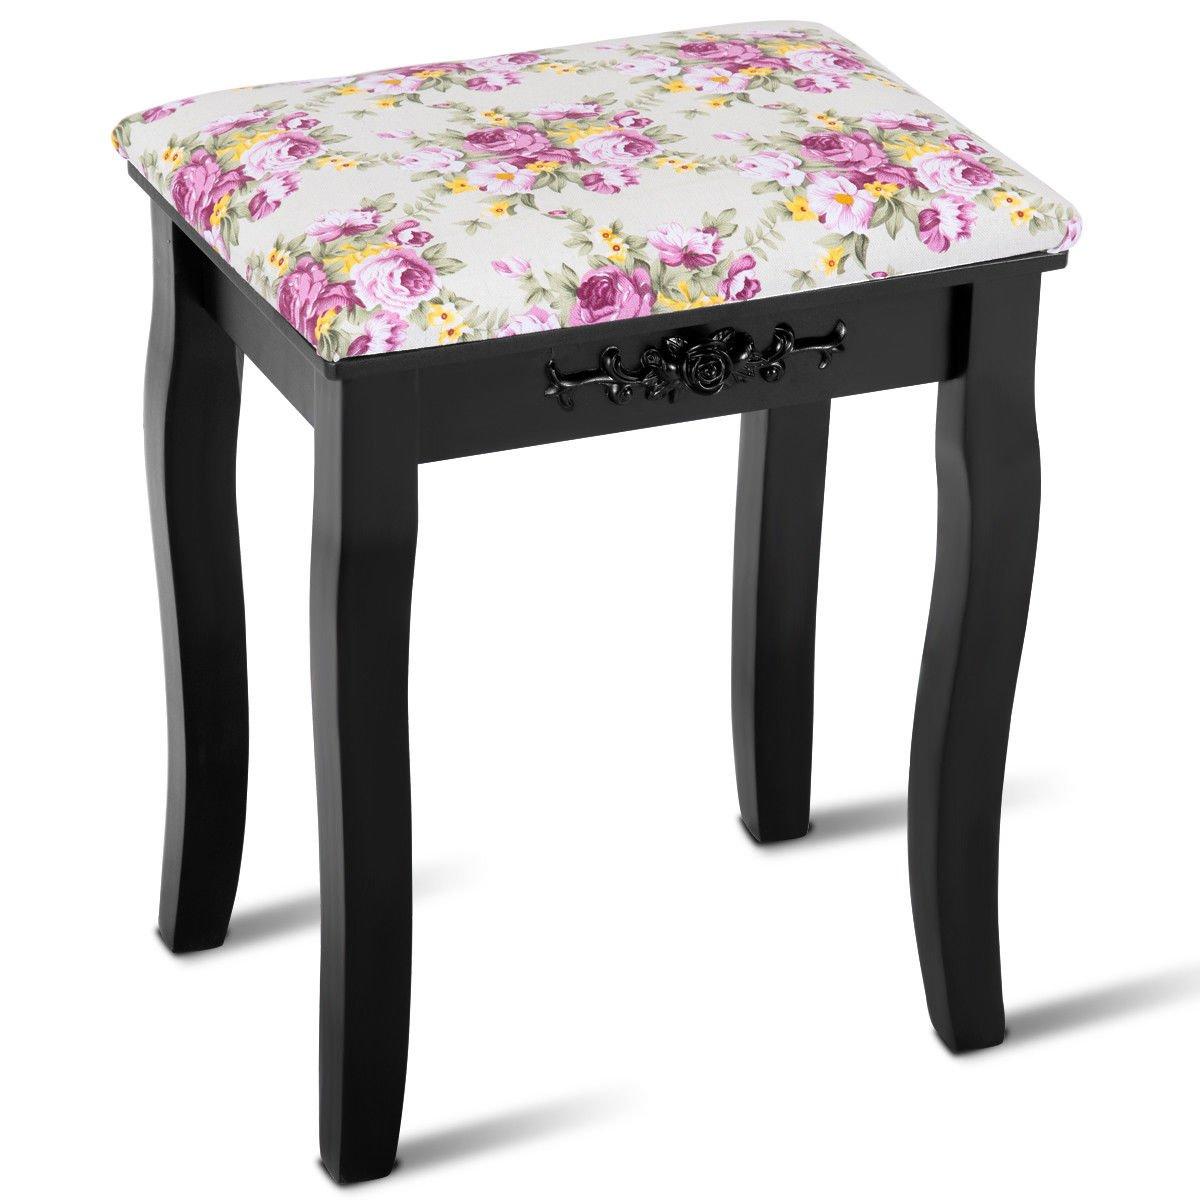 Giantex Vanity Stool Wood Dressing Padded Chair Makeup Piano Seat Make Up Bench w/Rose cushion (Black)